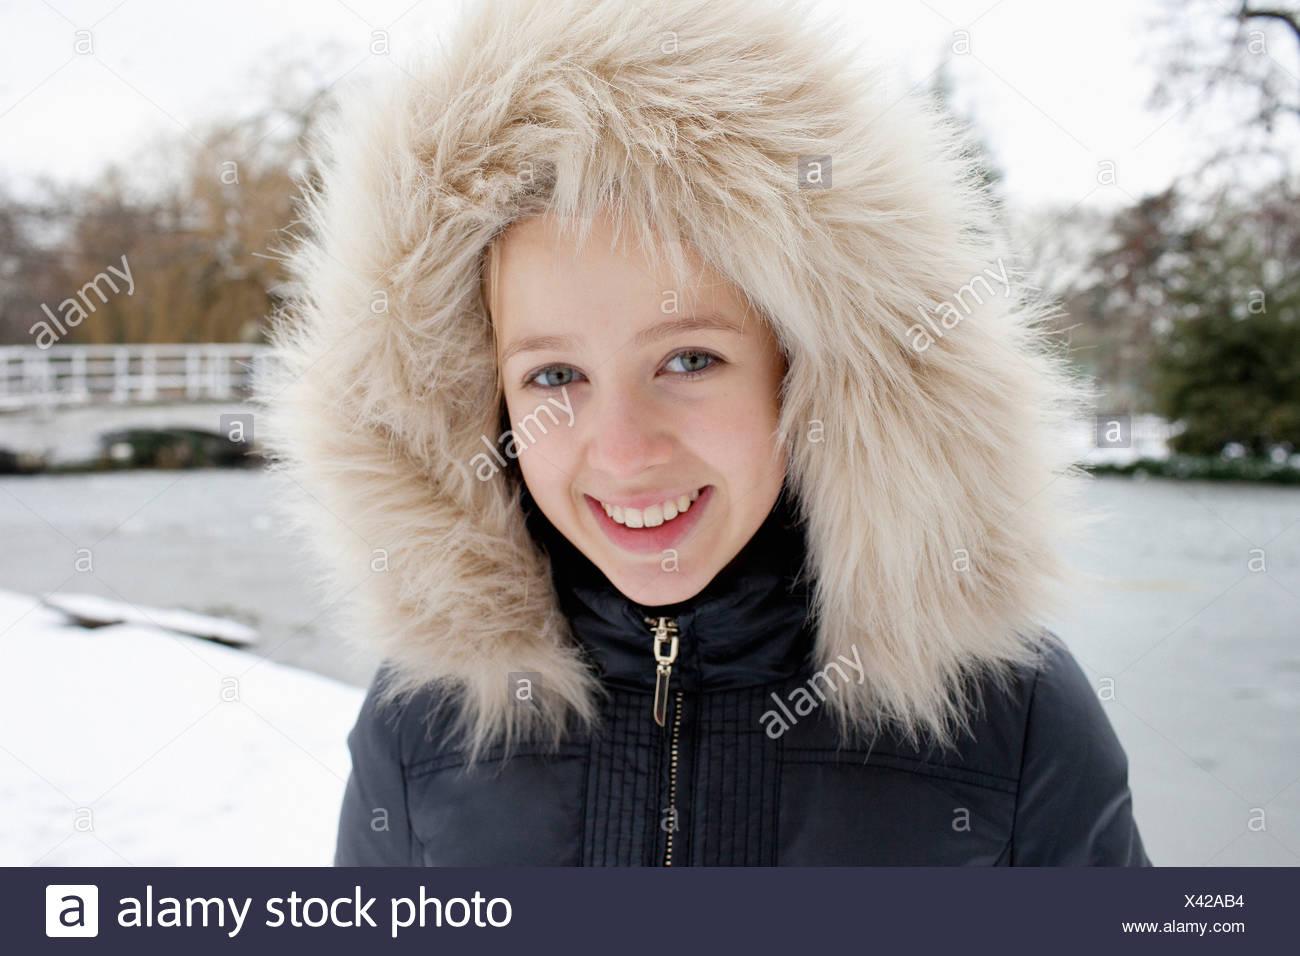 Smiling girl wearing fur hood in snow - Stock Image